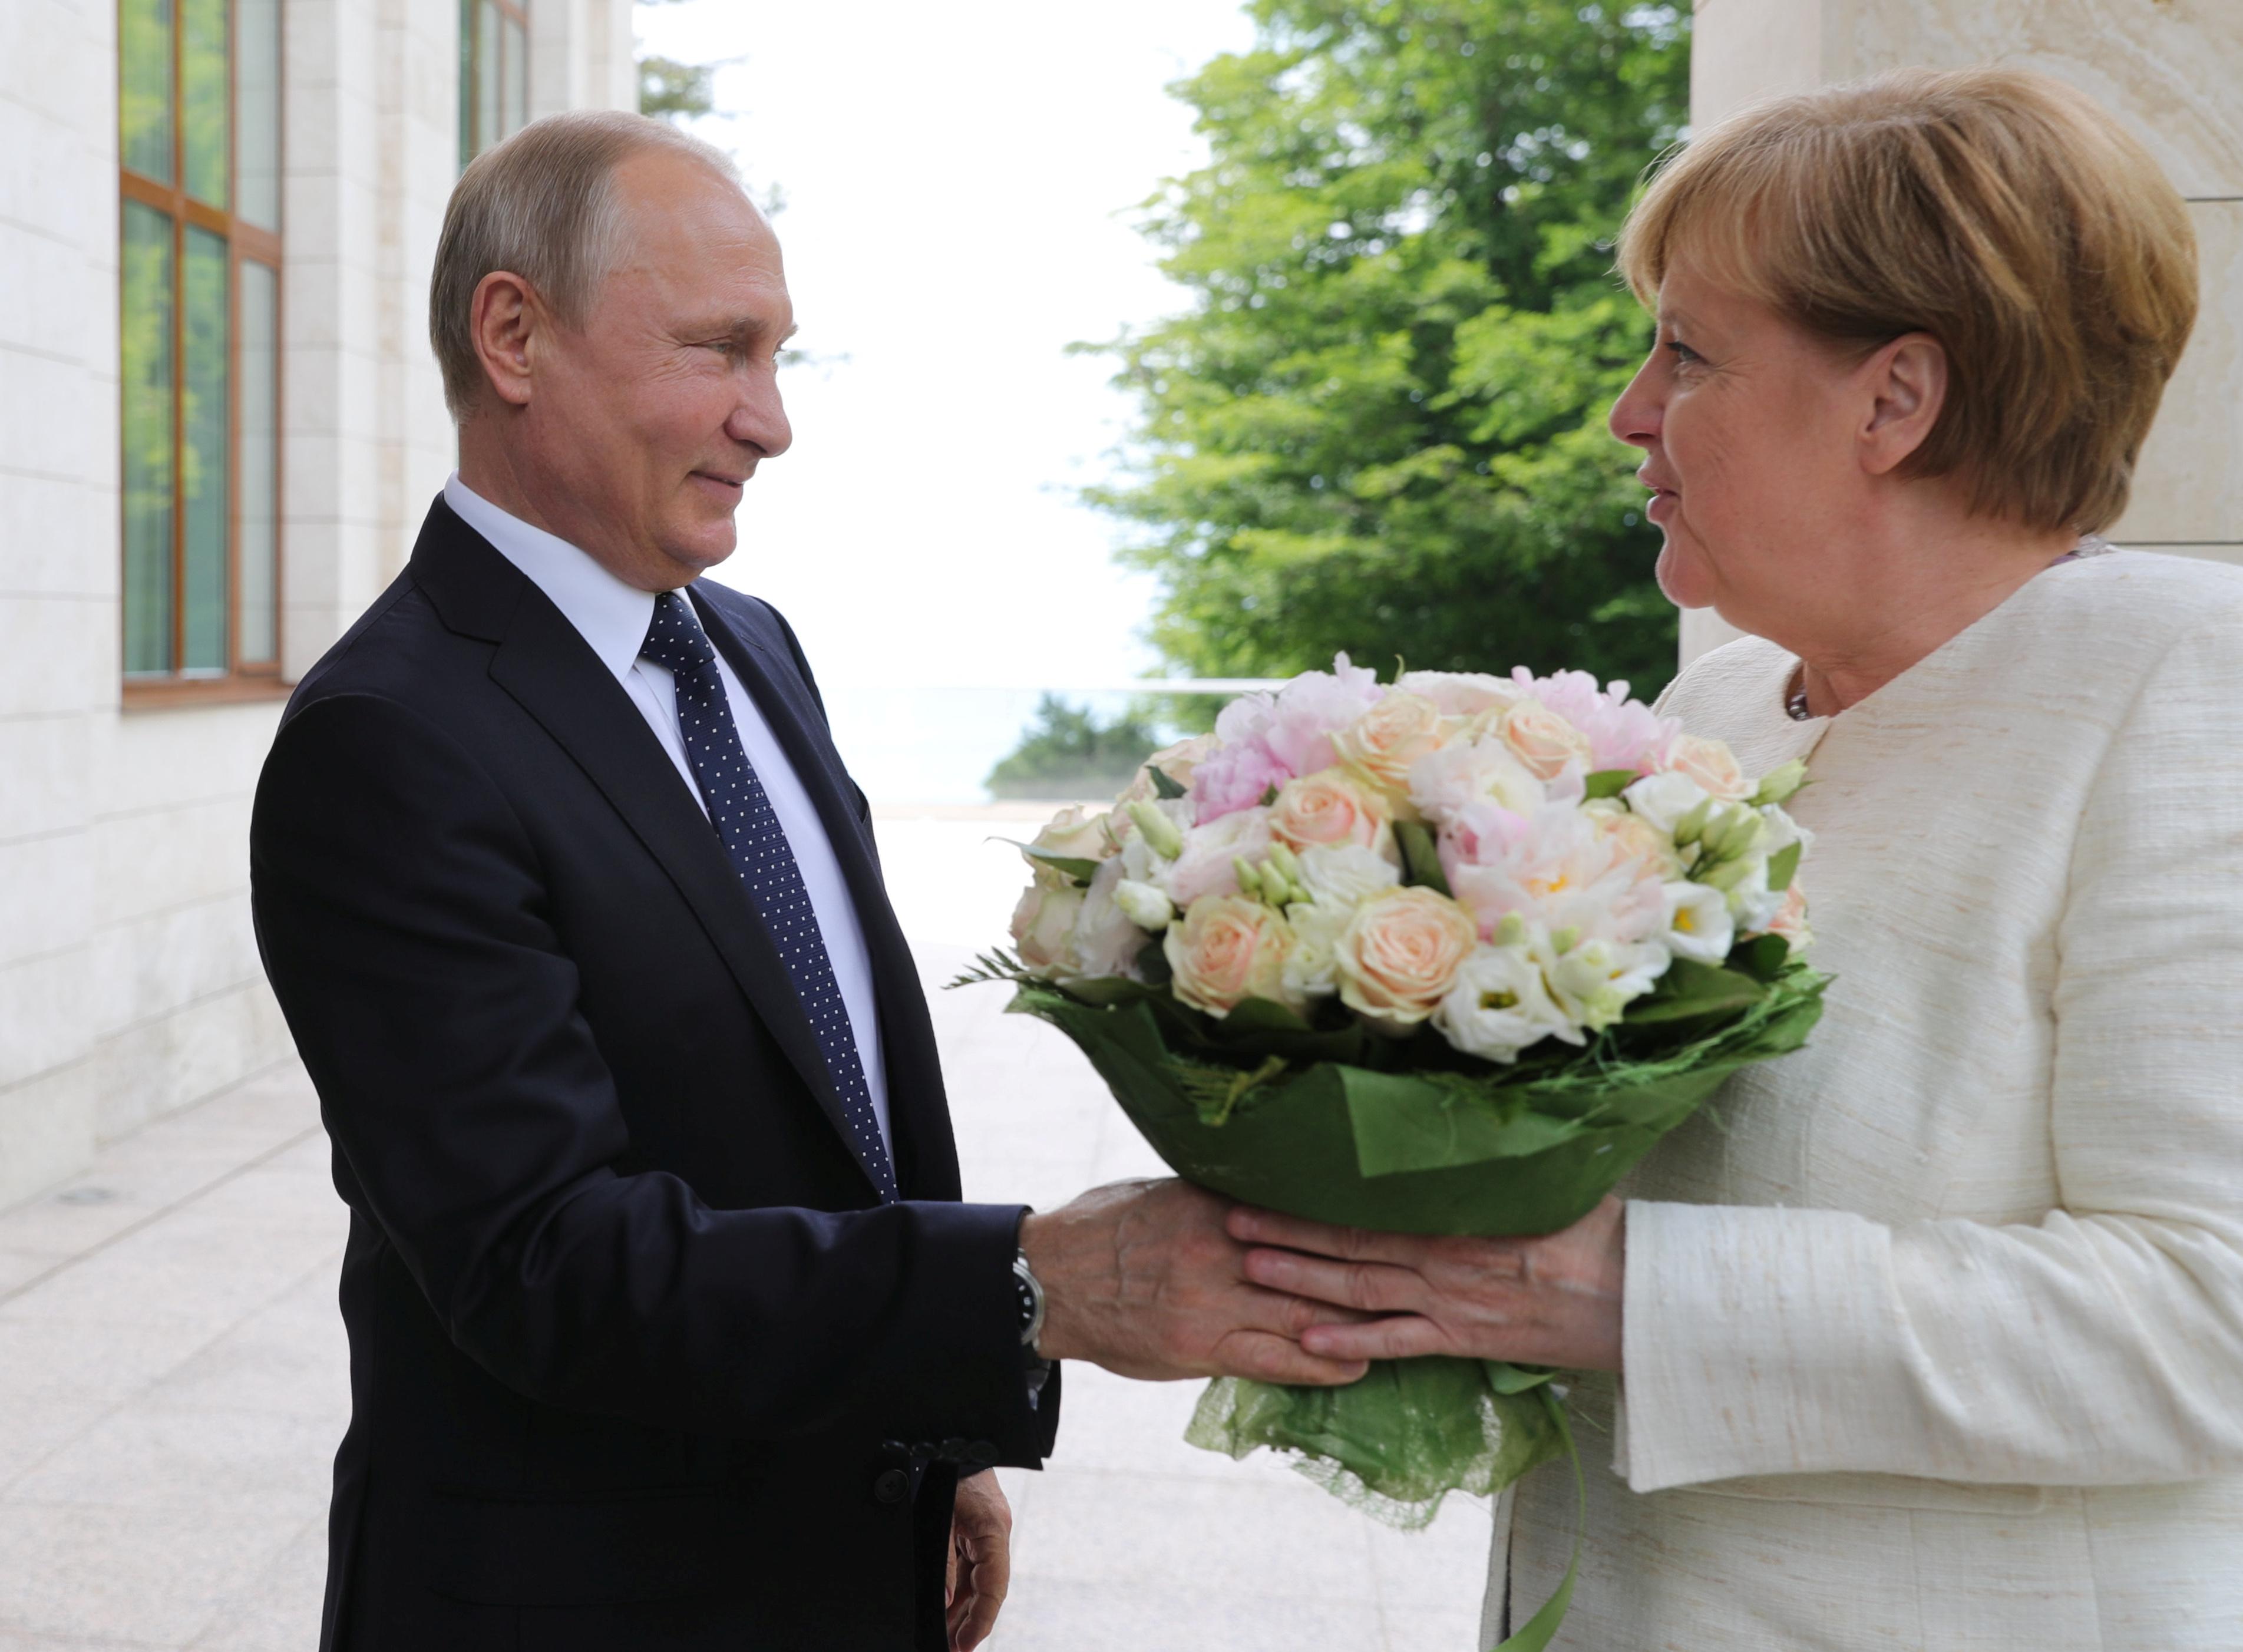 Russian President Vladimir Putin welcomes German Chancellor Angela Merkel during their meeting in the Black Sea resort of Sochi, Russia May 18, 2018. Sputnik/Mikhail Klimentyev/Kremlin via REUTERS ATTENTION